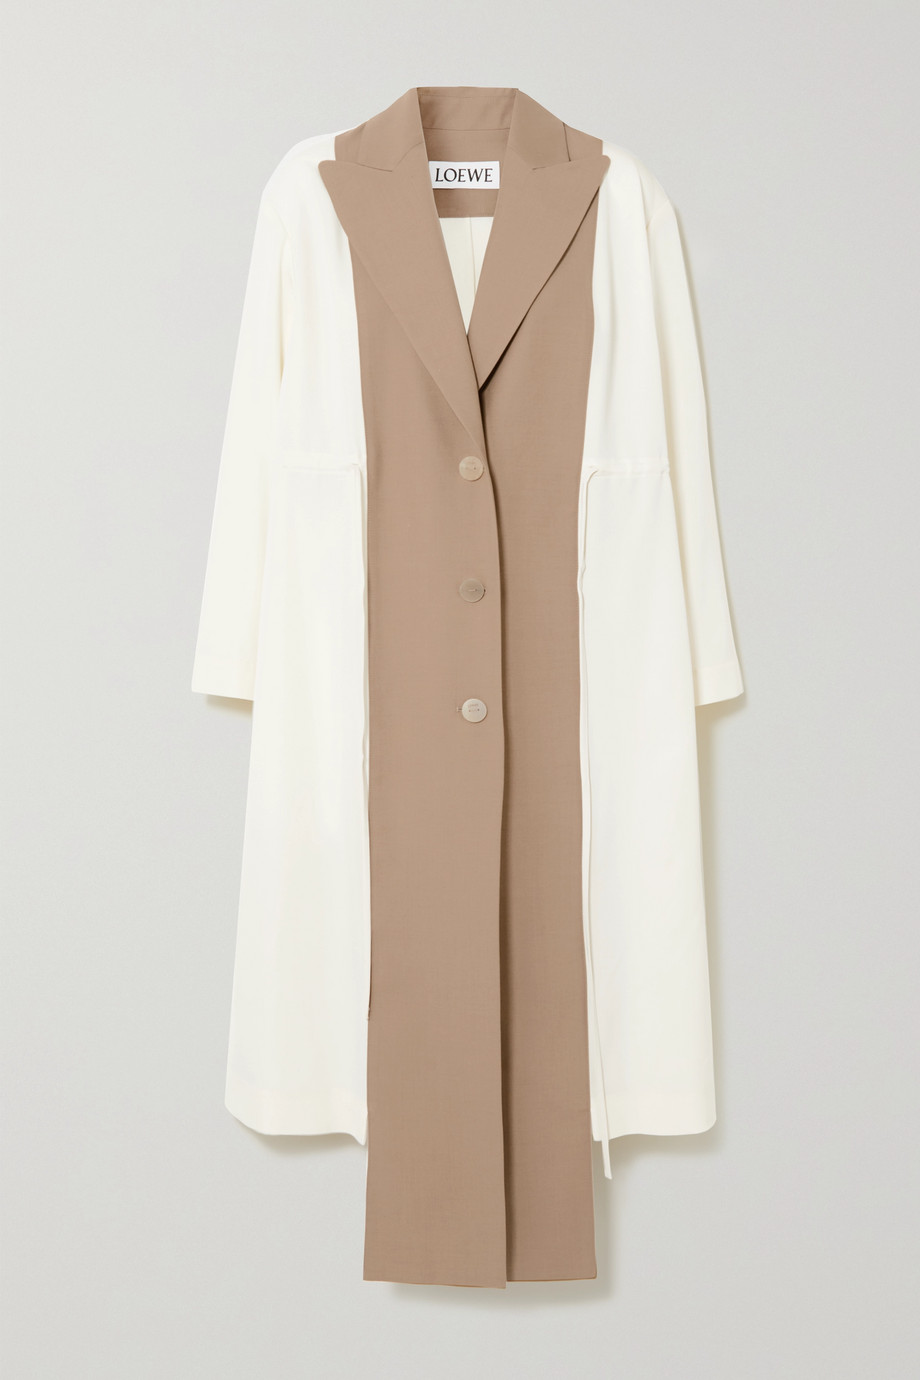 Loewe Two-tone wool coat